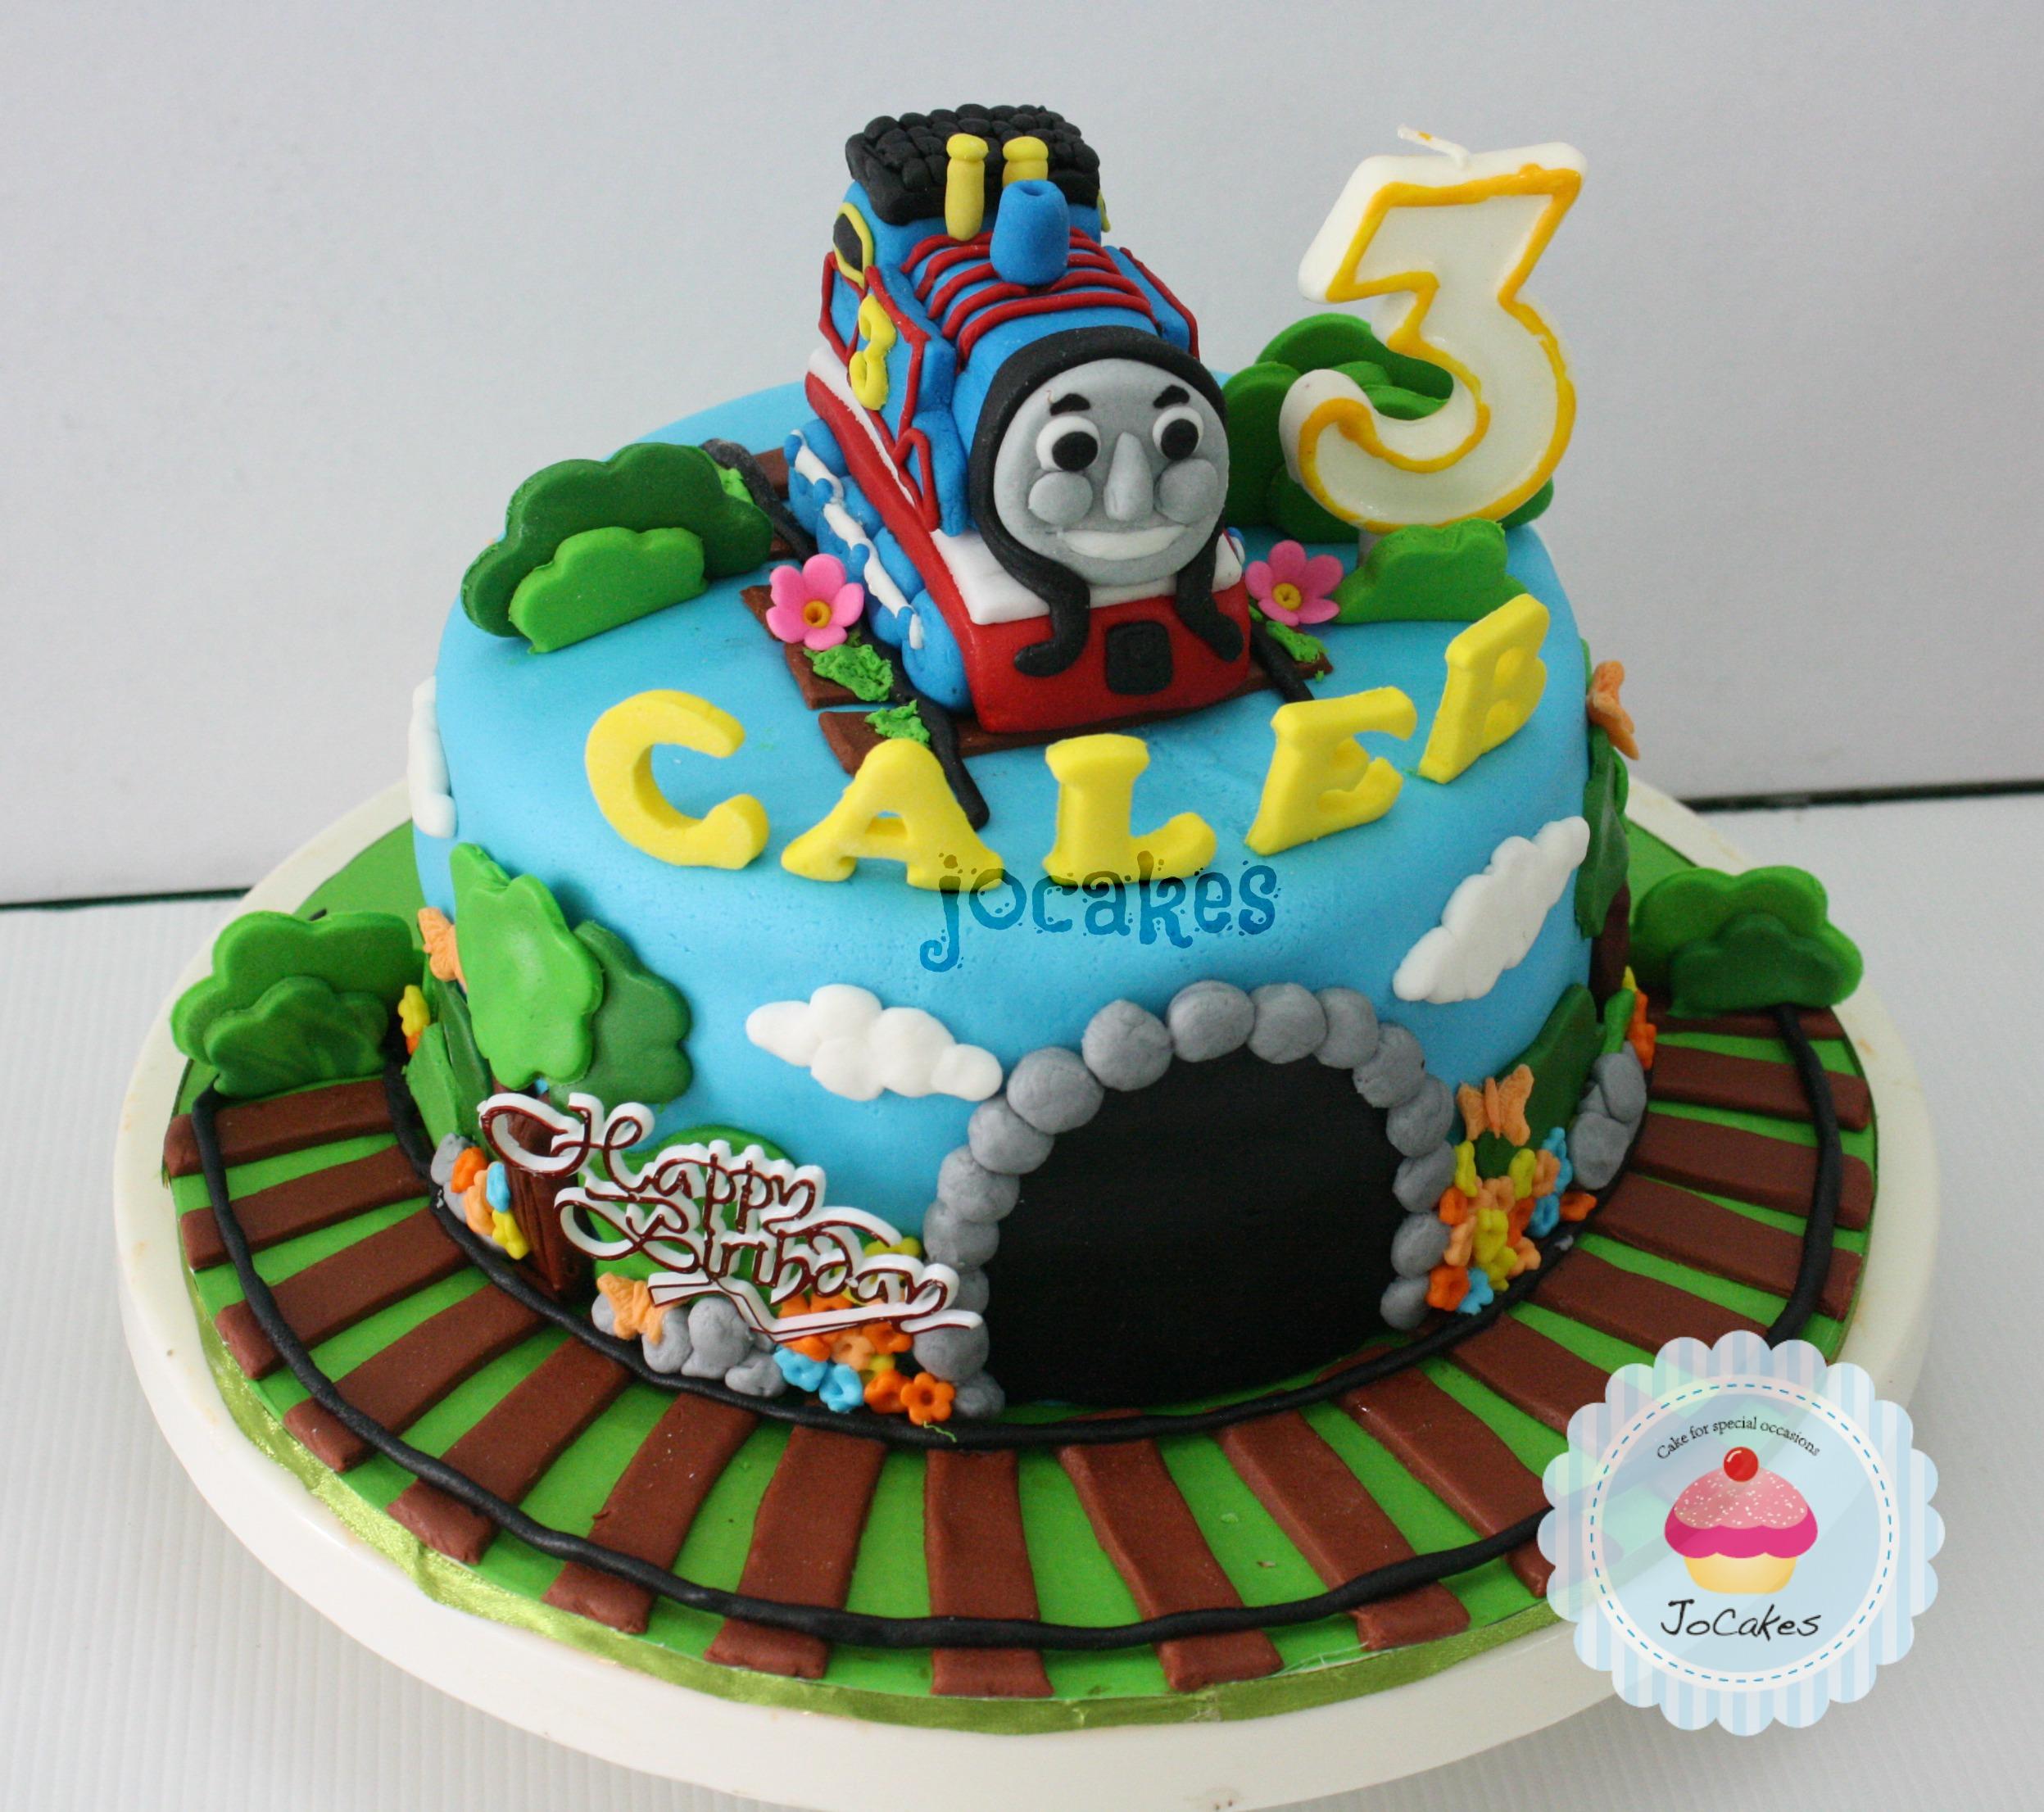 Thomas The Train Cake For Caleb Jocakes